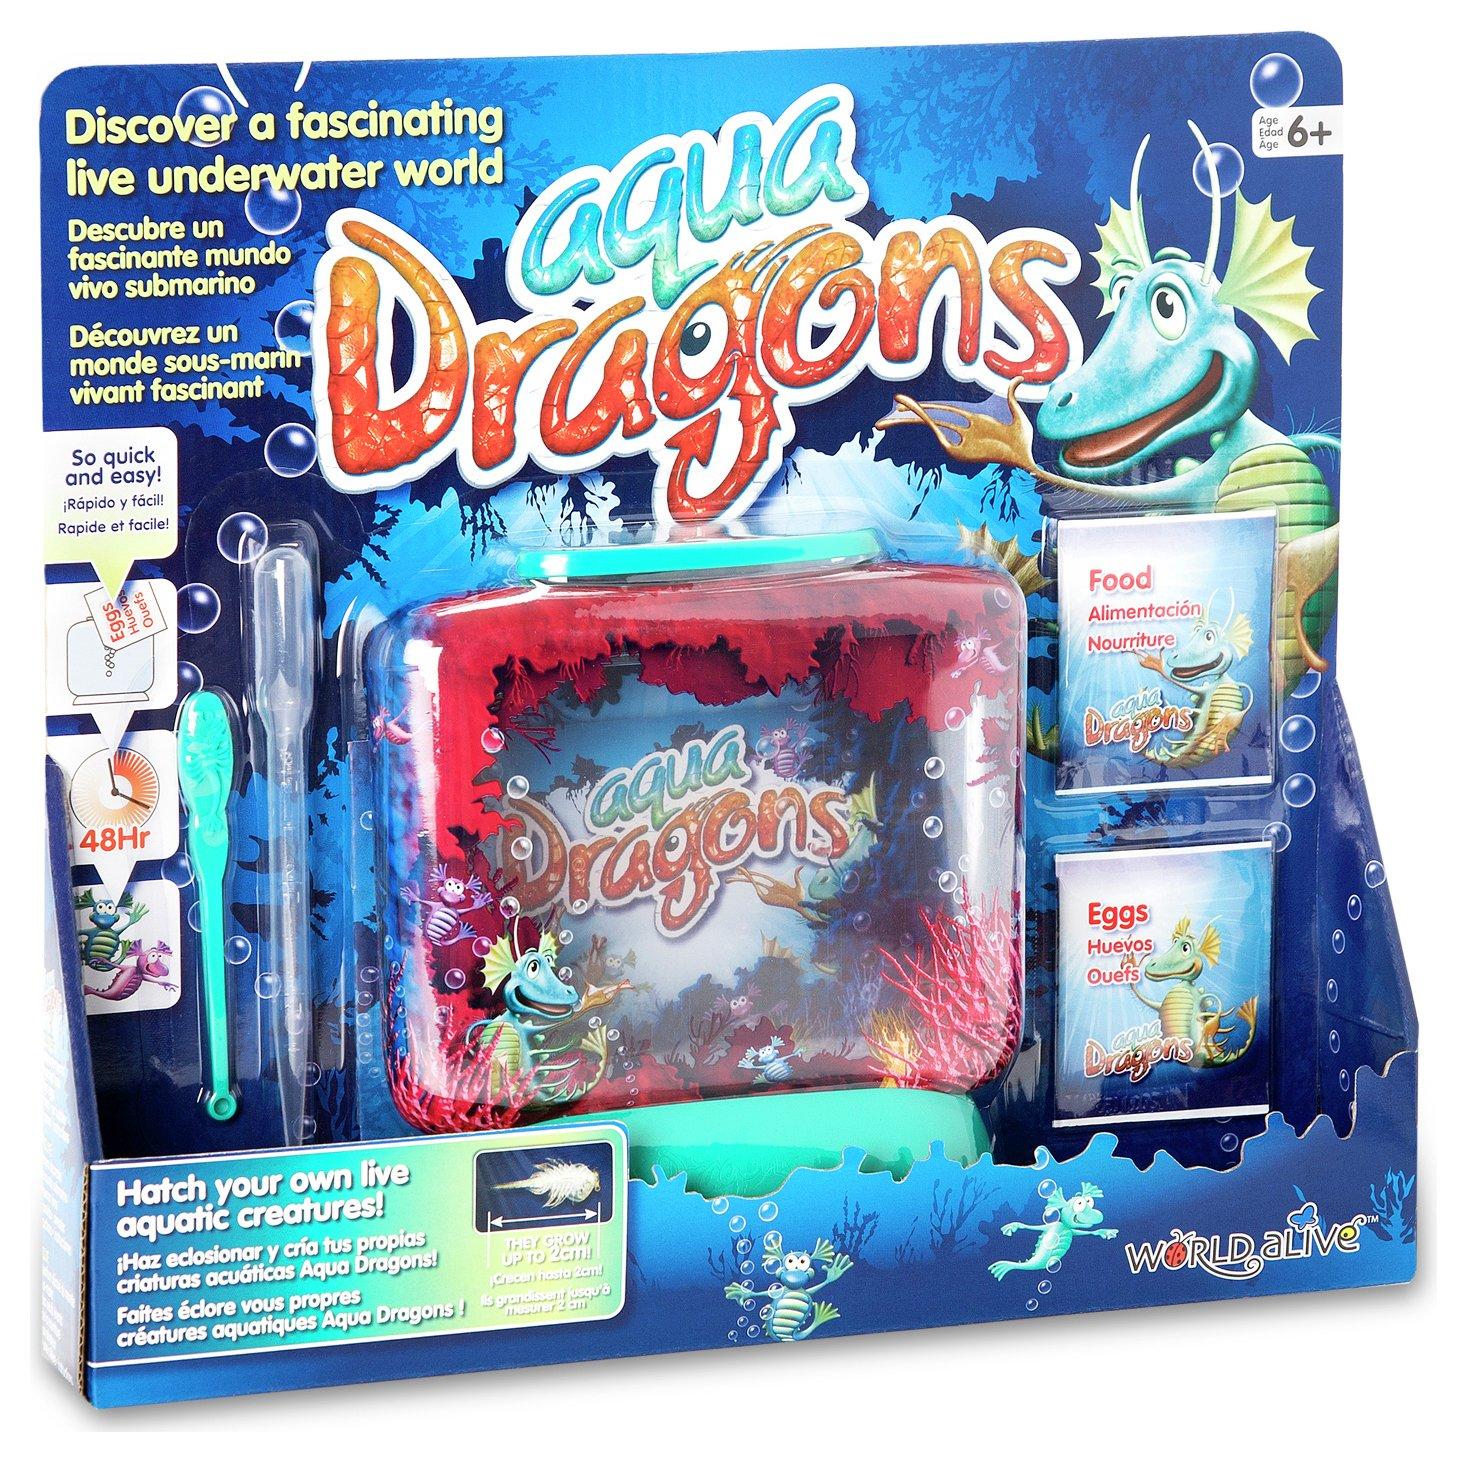 Image of Aqua Dragons Underwater World.